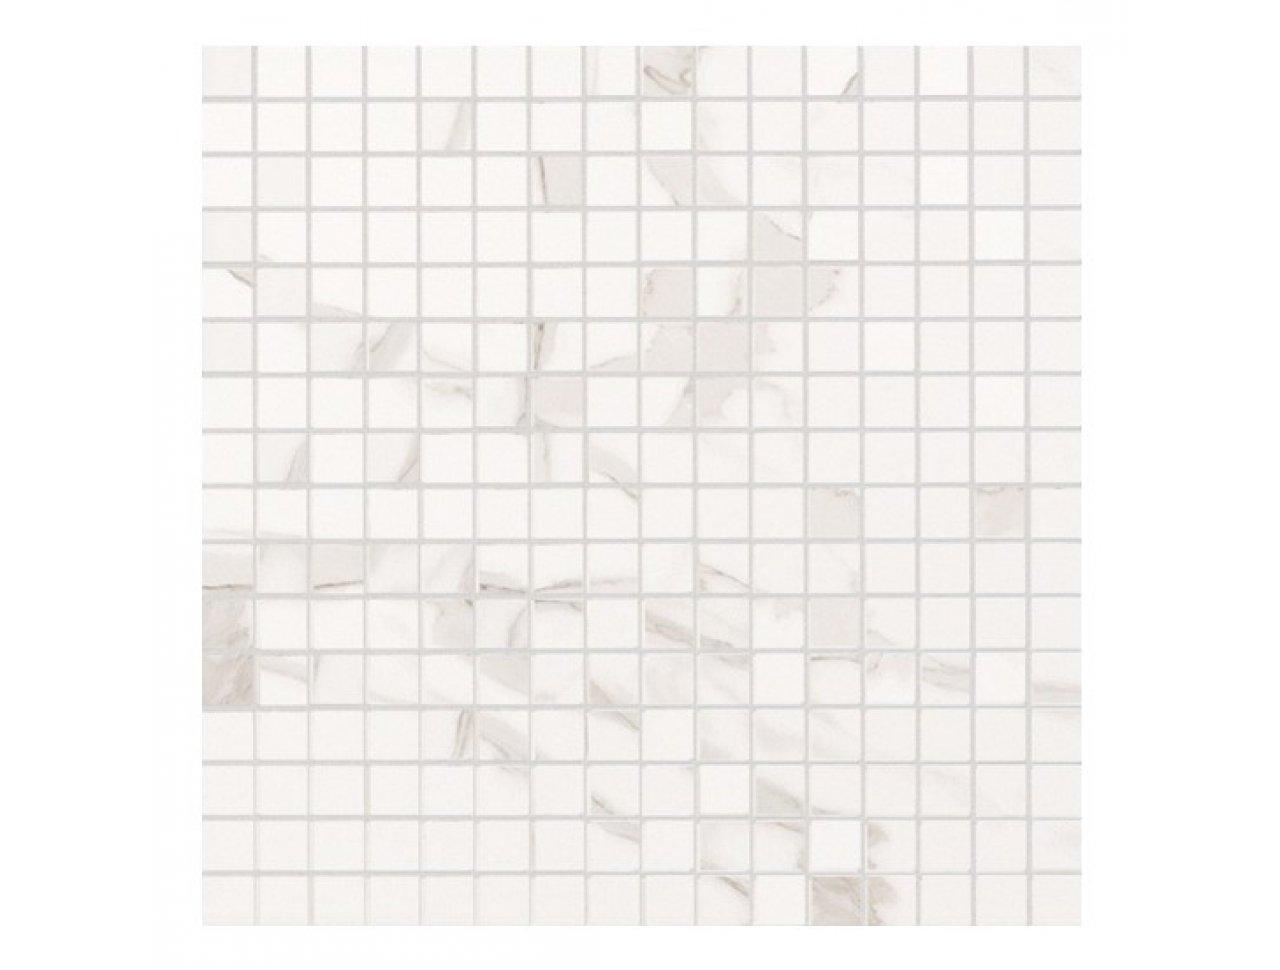 Мозаика FAP Roma Diamond Statuario Mosaico 30.5 x 30.5 см, Арт. fNH3